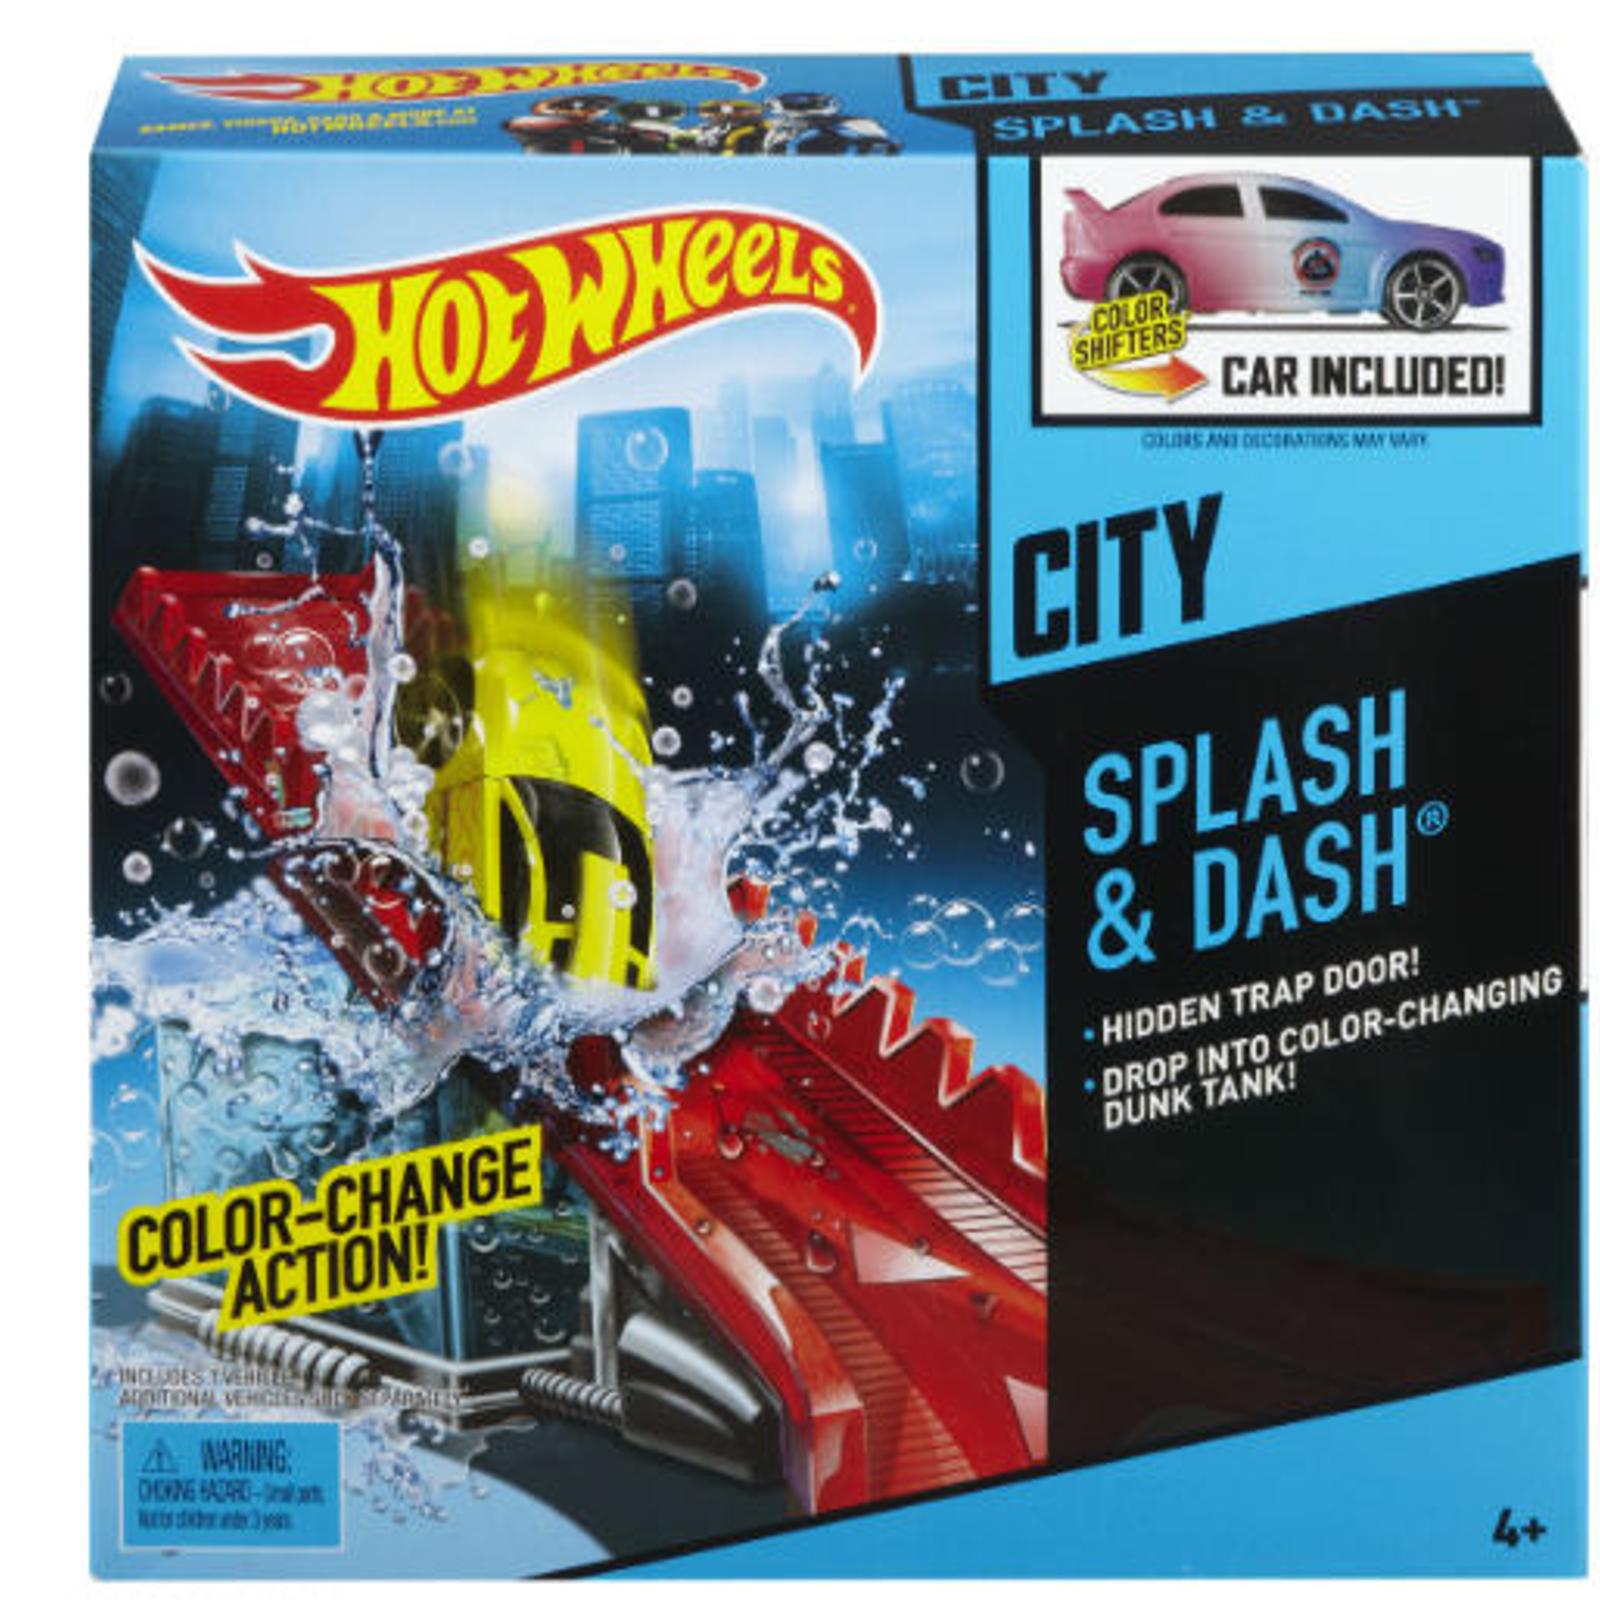 ������� ����� Hot Wheels ������� ����� Color Shifters Splash & Dash